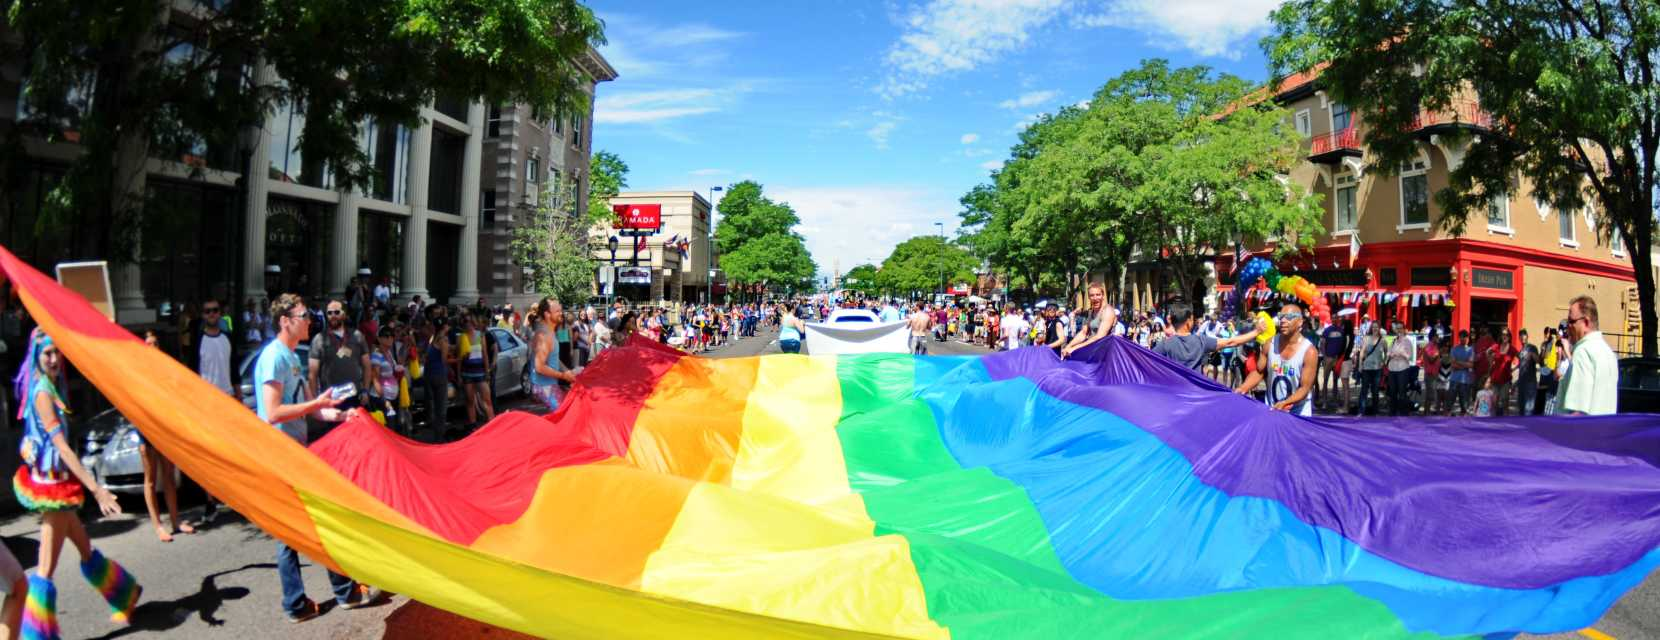 LGBTQ Rainbow flag at the Denver PrideFest parade